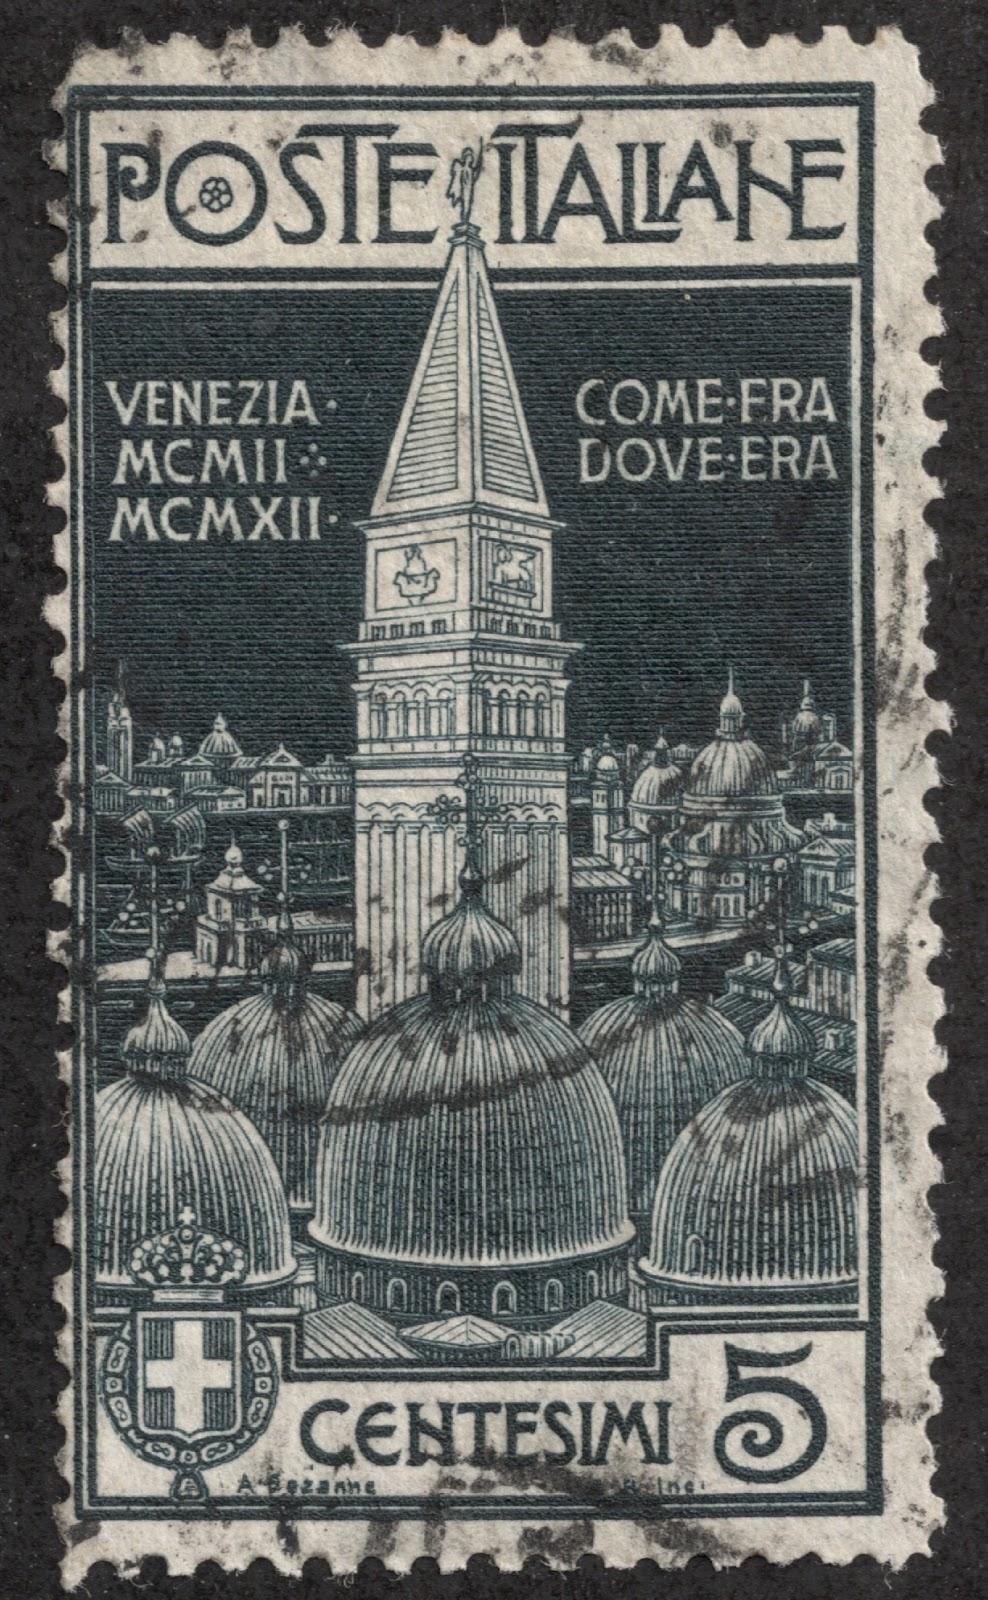 Big Blue 1840 1940 Italy 1862 1925